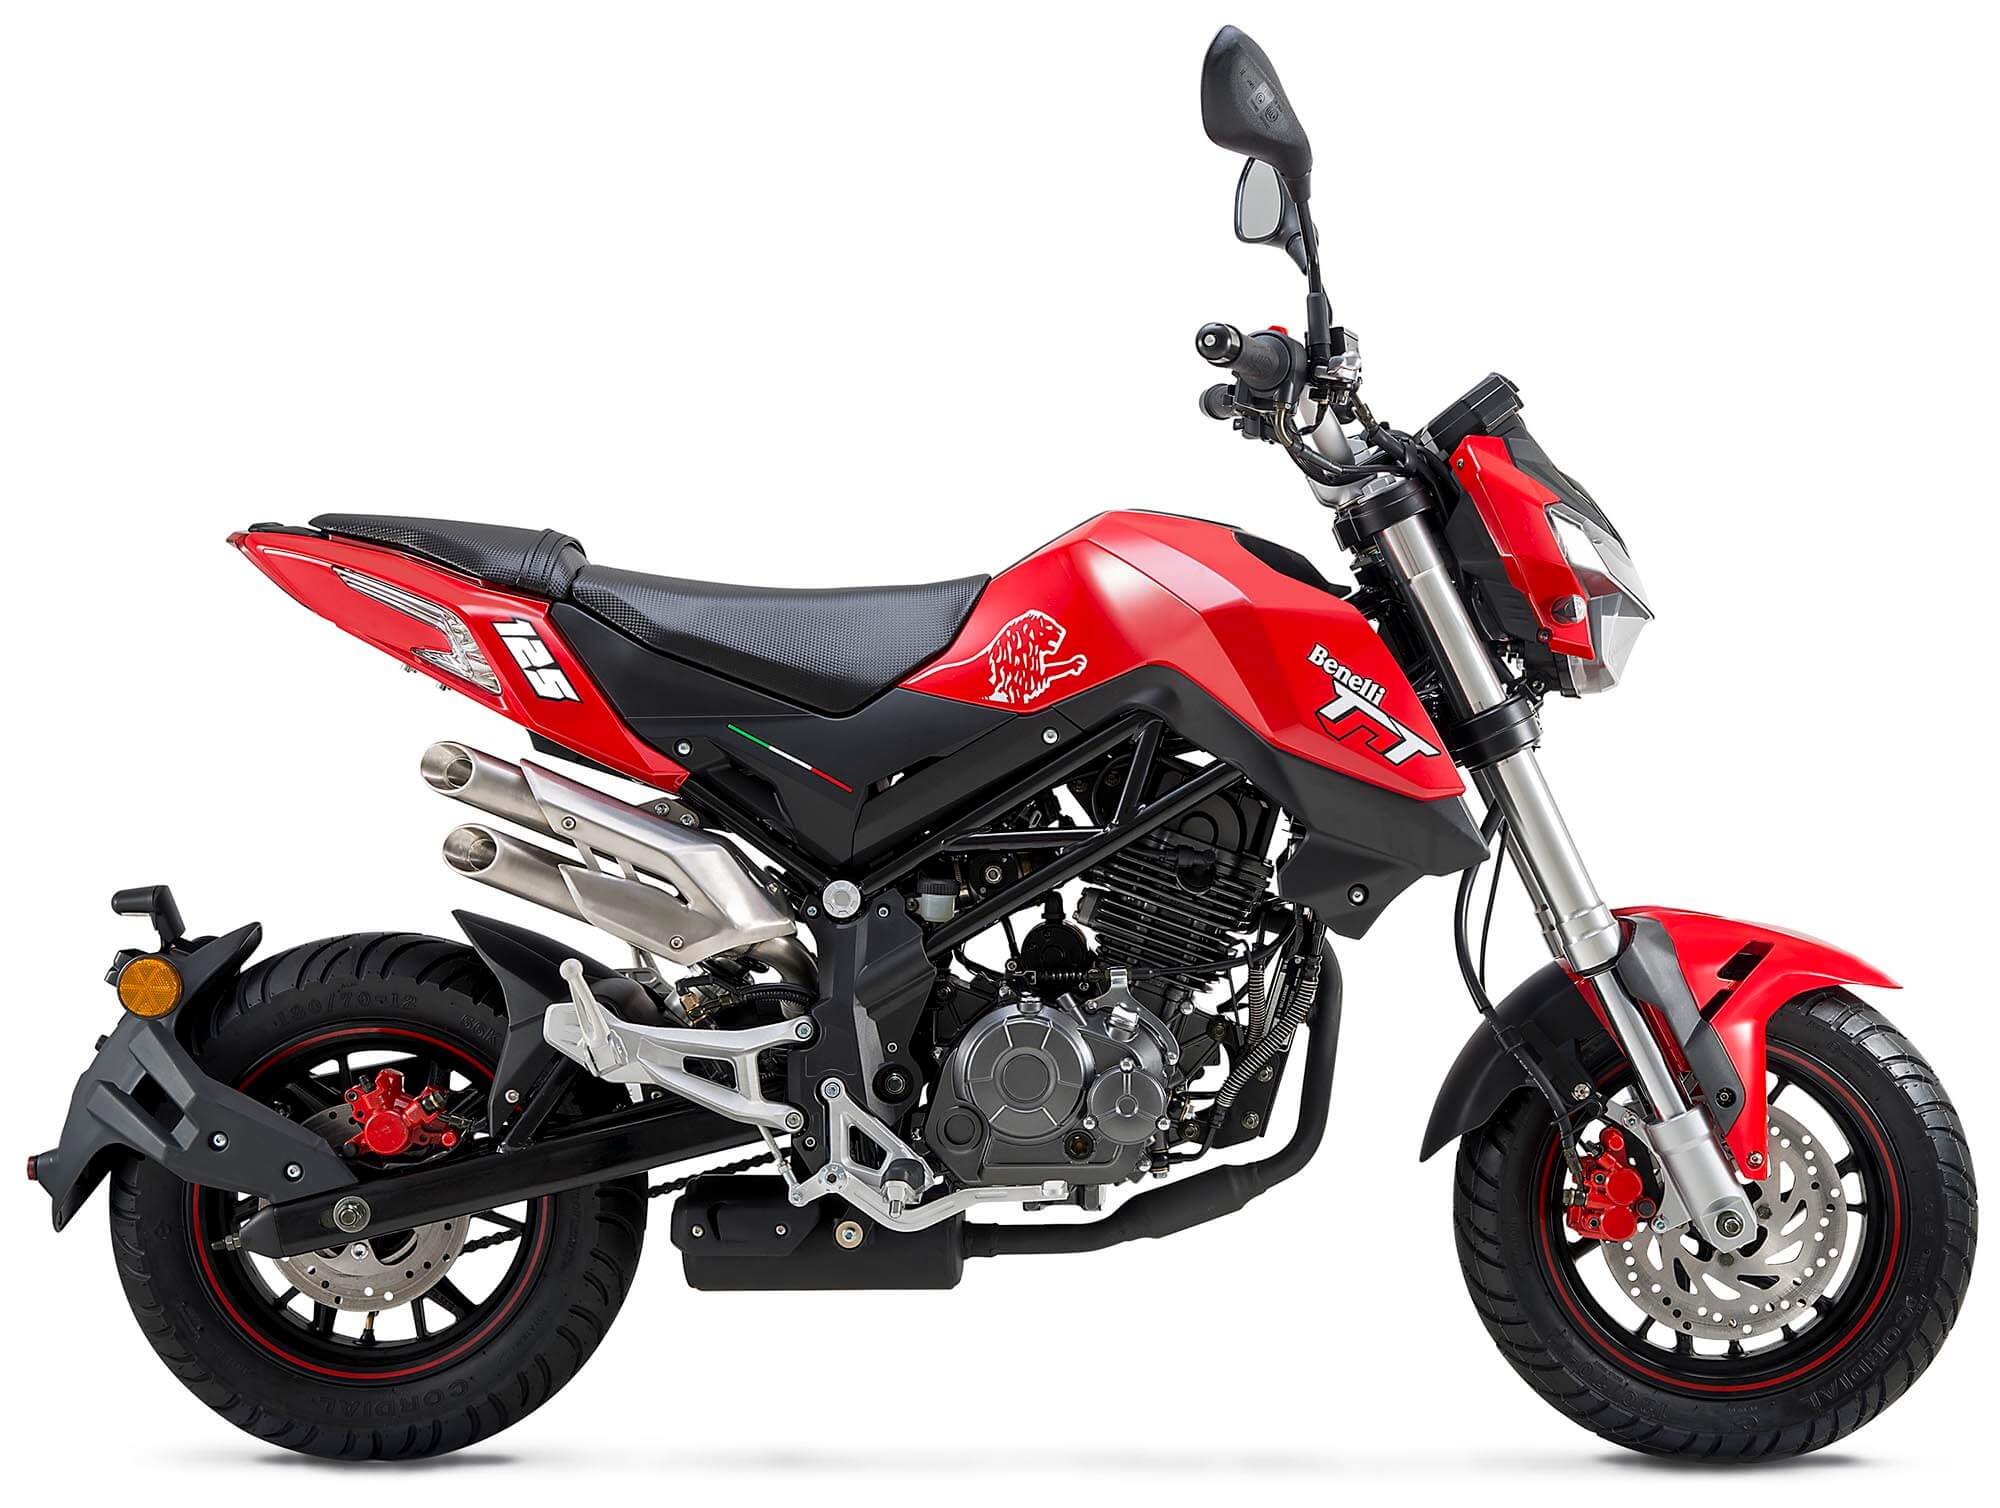 comprar-motos-benelli-tnt-125-rojo-motissimo-barcelona